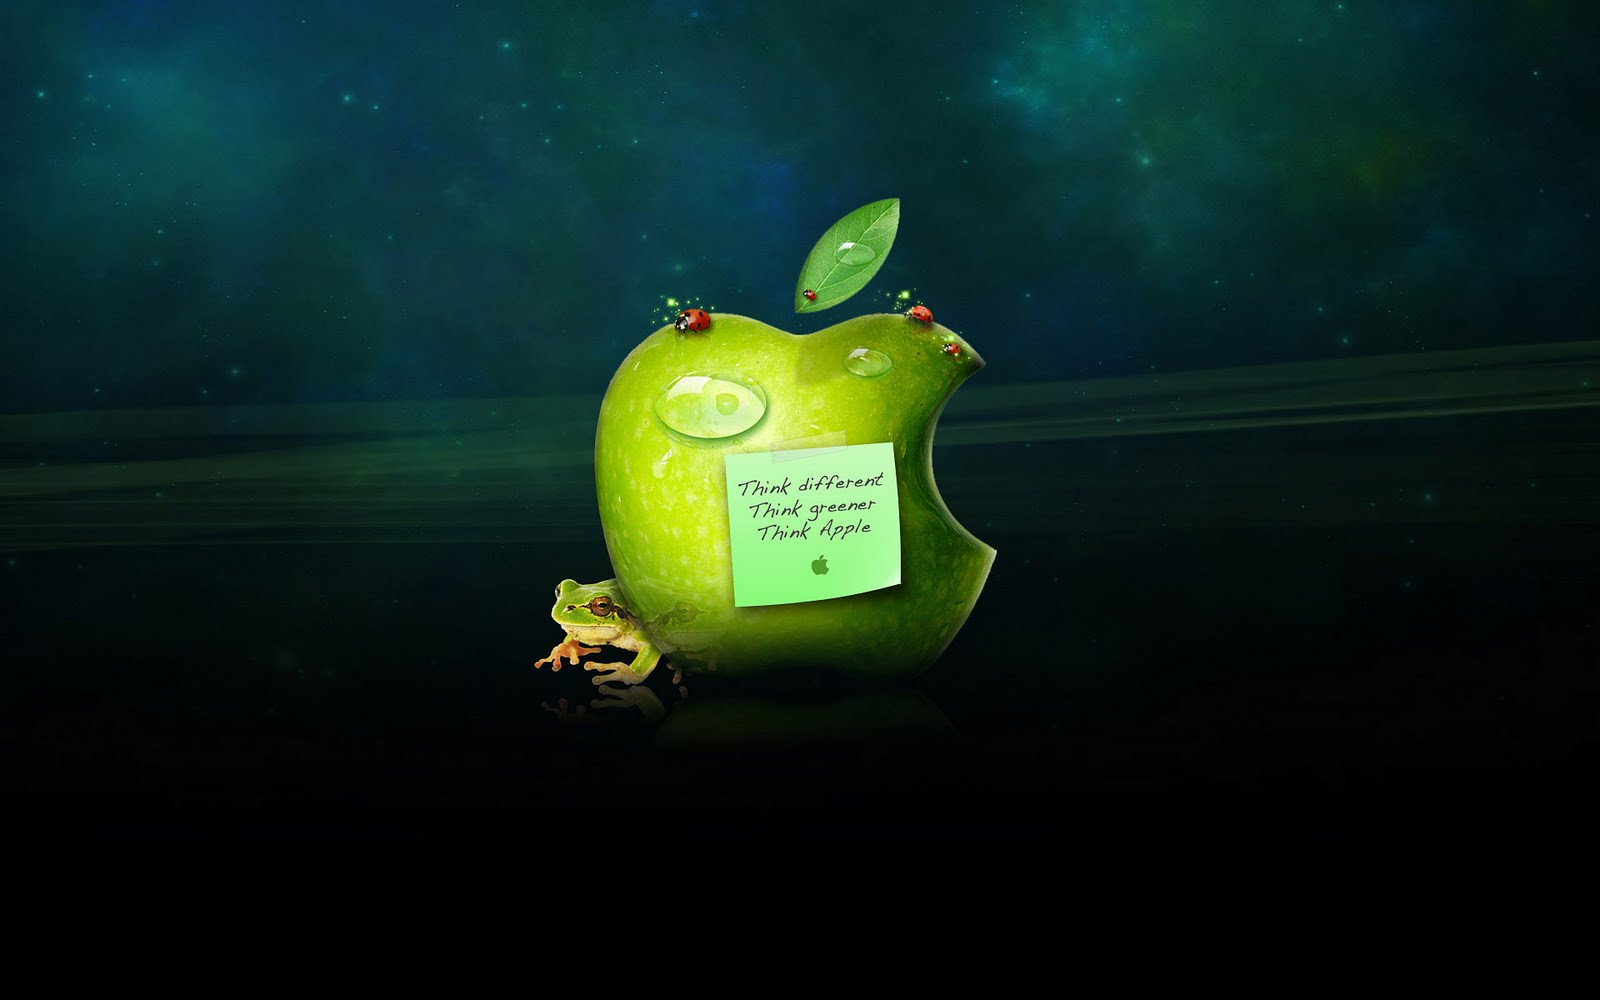 http://3.bp.blogspot.com/-ZyWhEDnjshU/TY18c-ugi-I/AAAAAAAAHfM/52jY7uRwHYk/s1600/Mac-Wallpaper-Apple-Mac-Wallpapers-Snow-Leopard-Wallpapers-HD-Apple-iPhone-Free-Desktop-Backgrounds-Red%252BBlack-Apple-sexy-mac-apple-lucy-pinder-wallpapers-indian-hollywood-ba